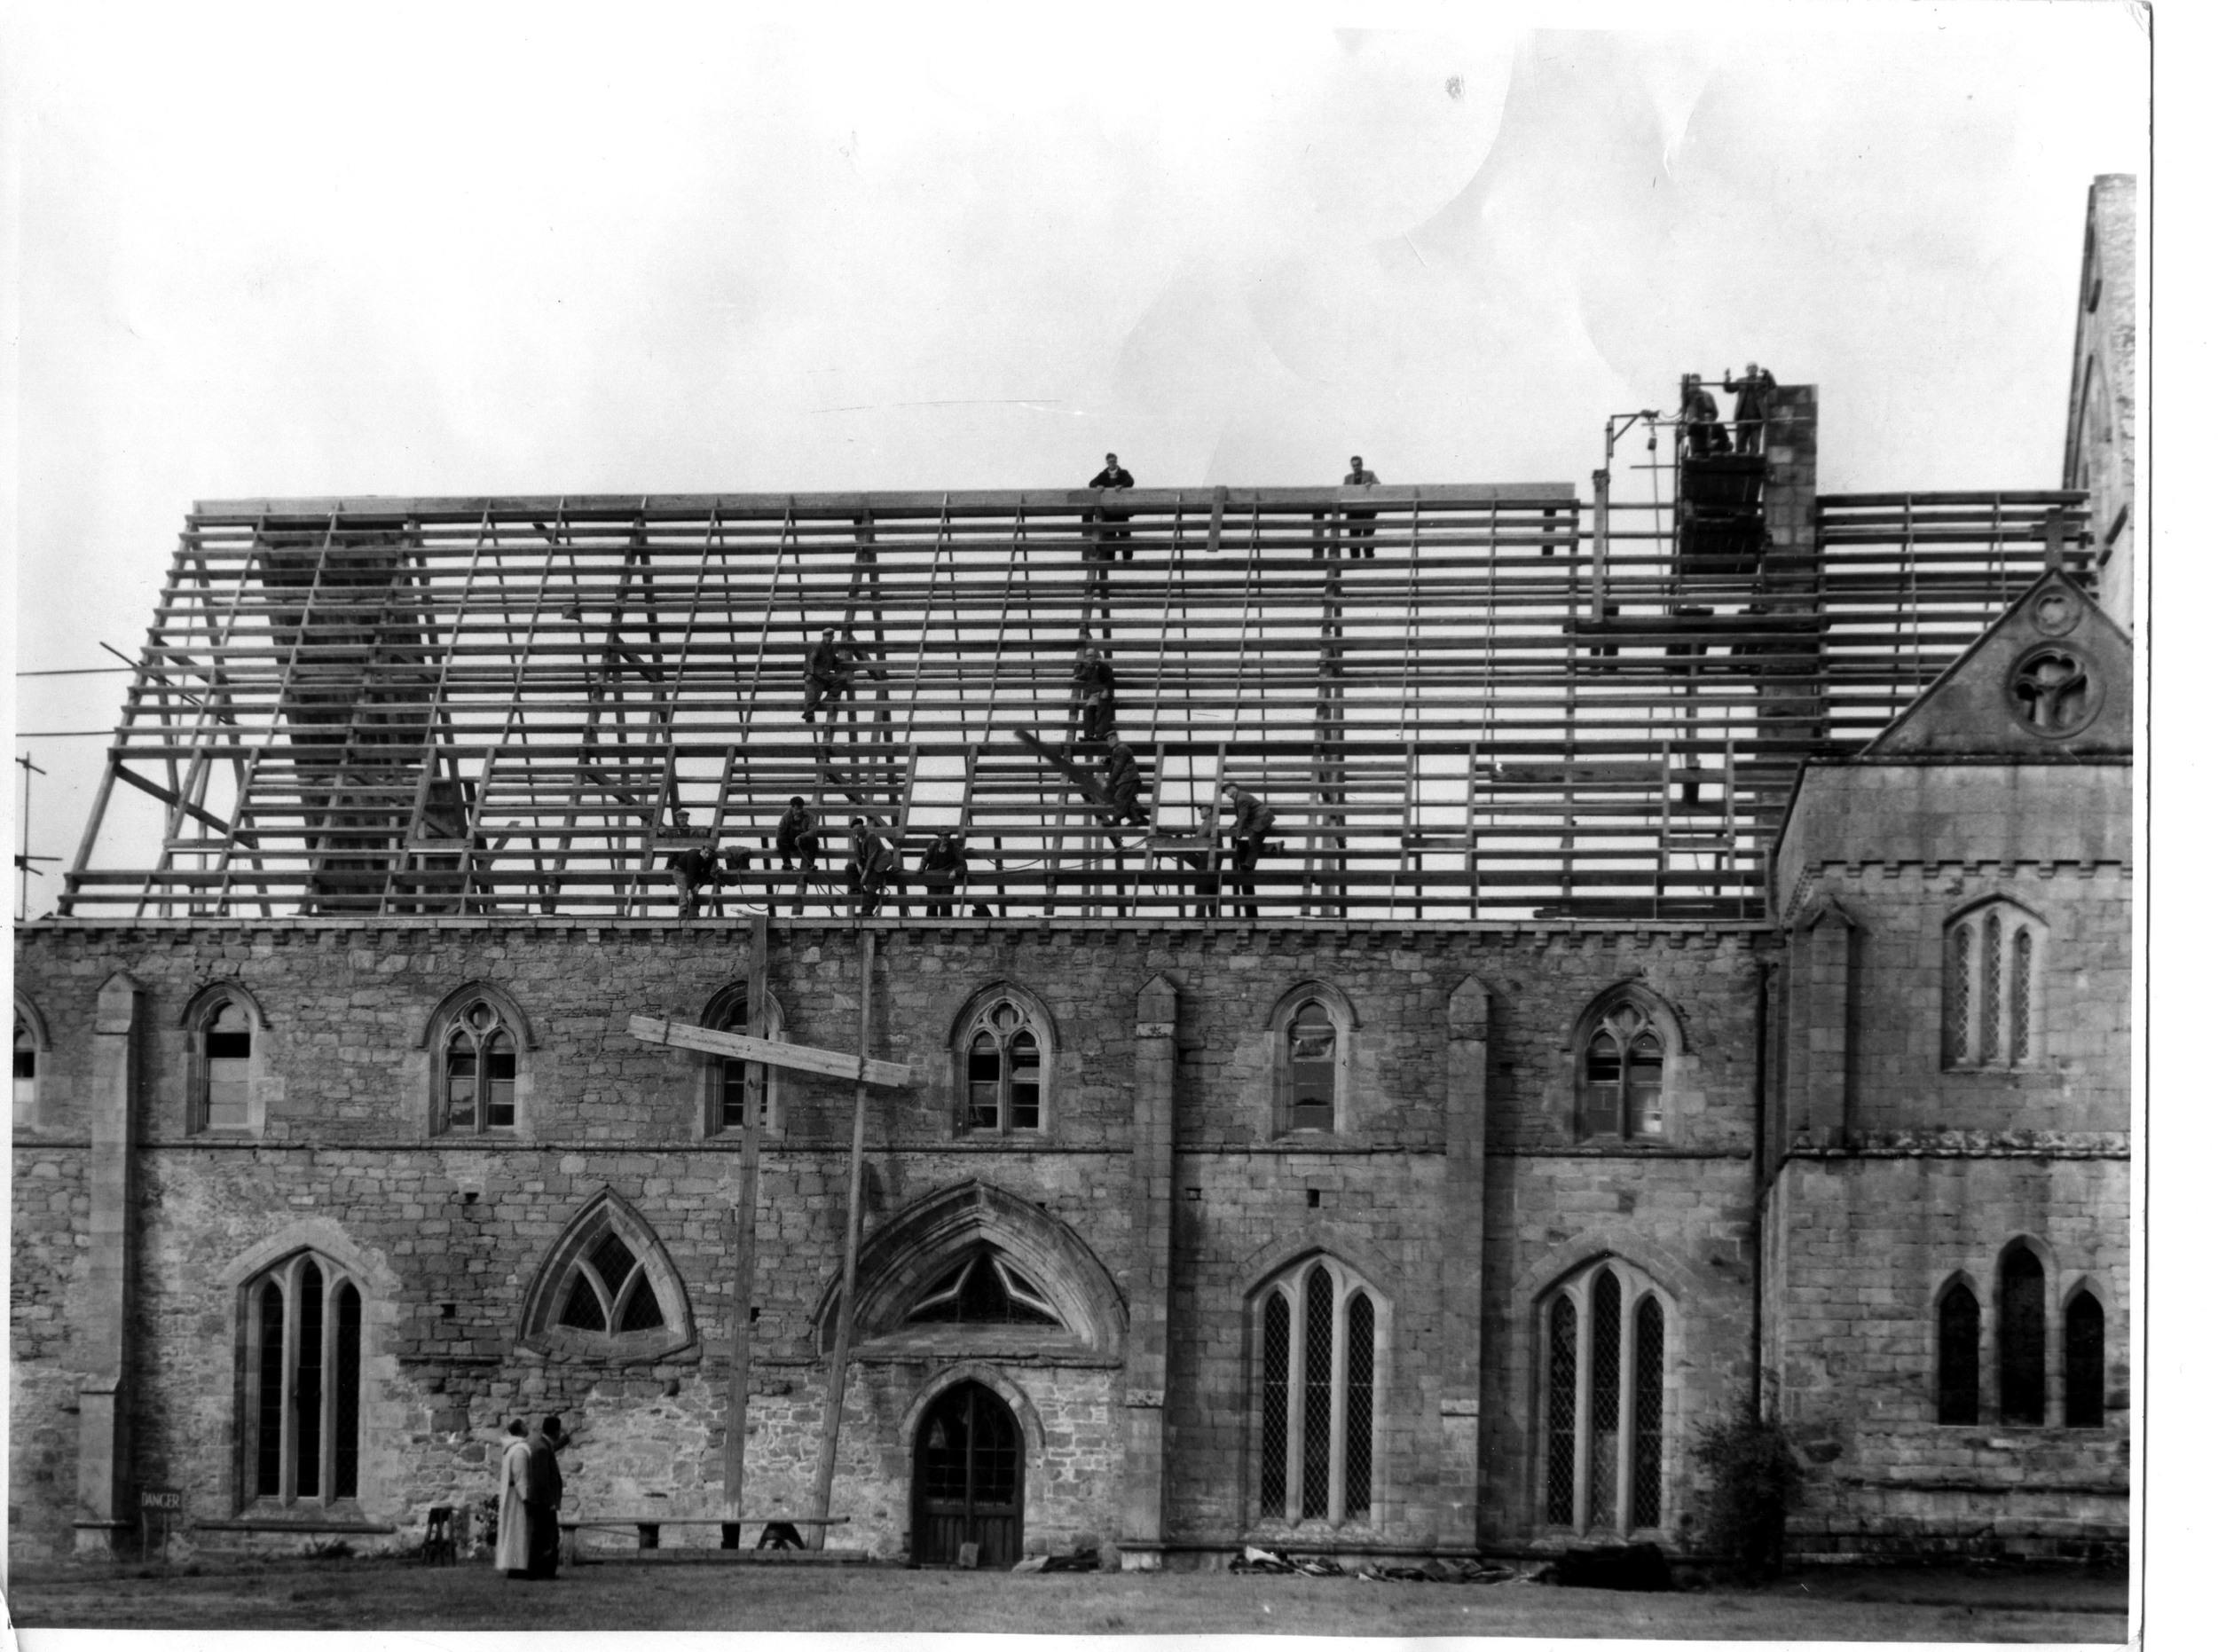 Restoration work in the 1960s